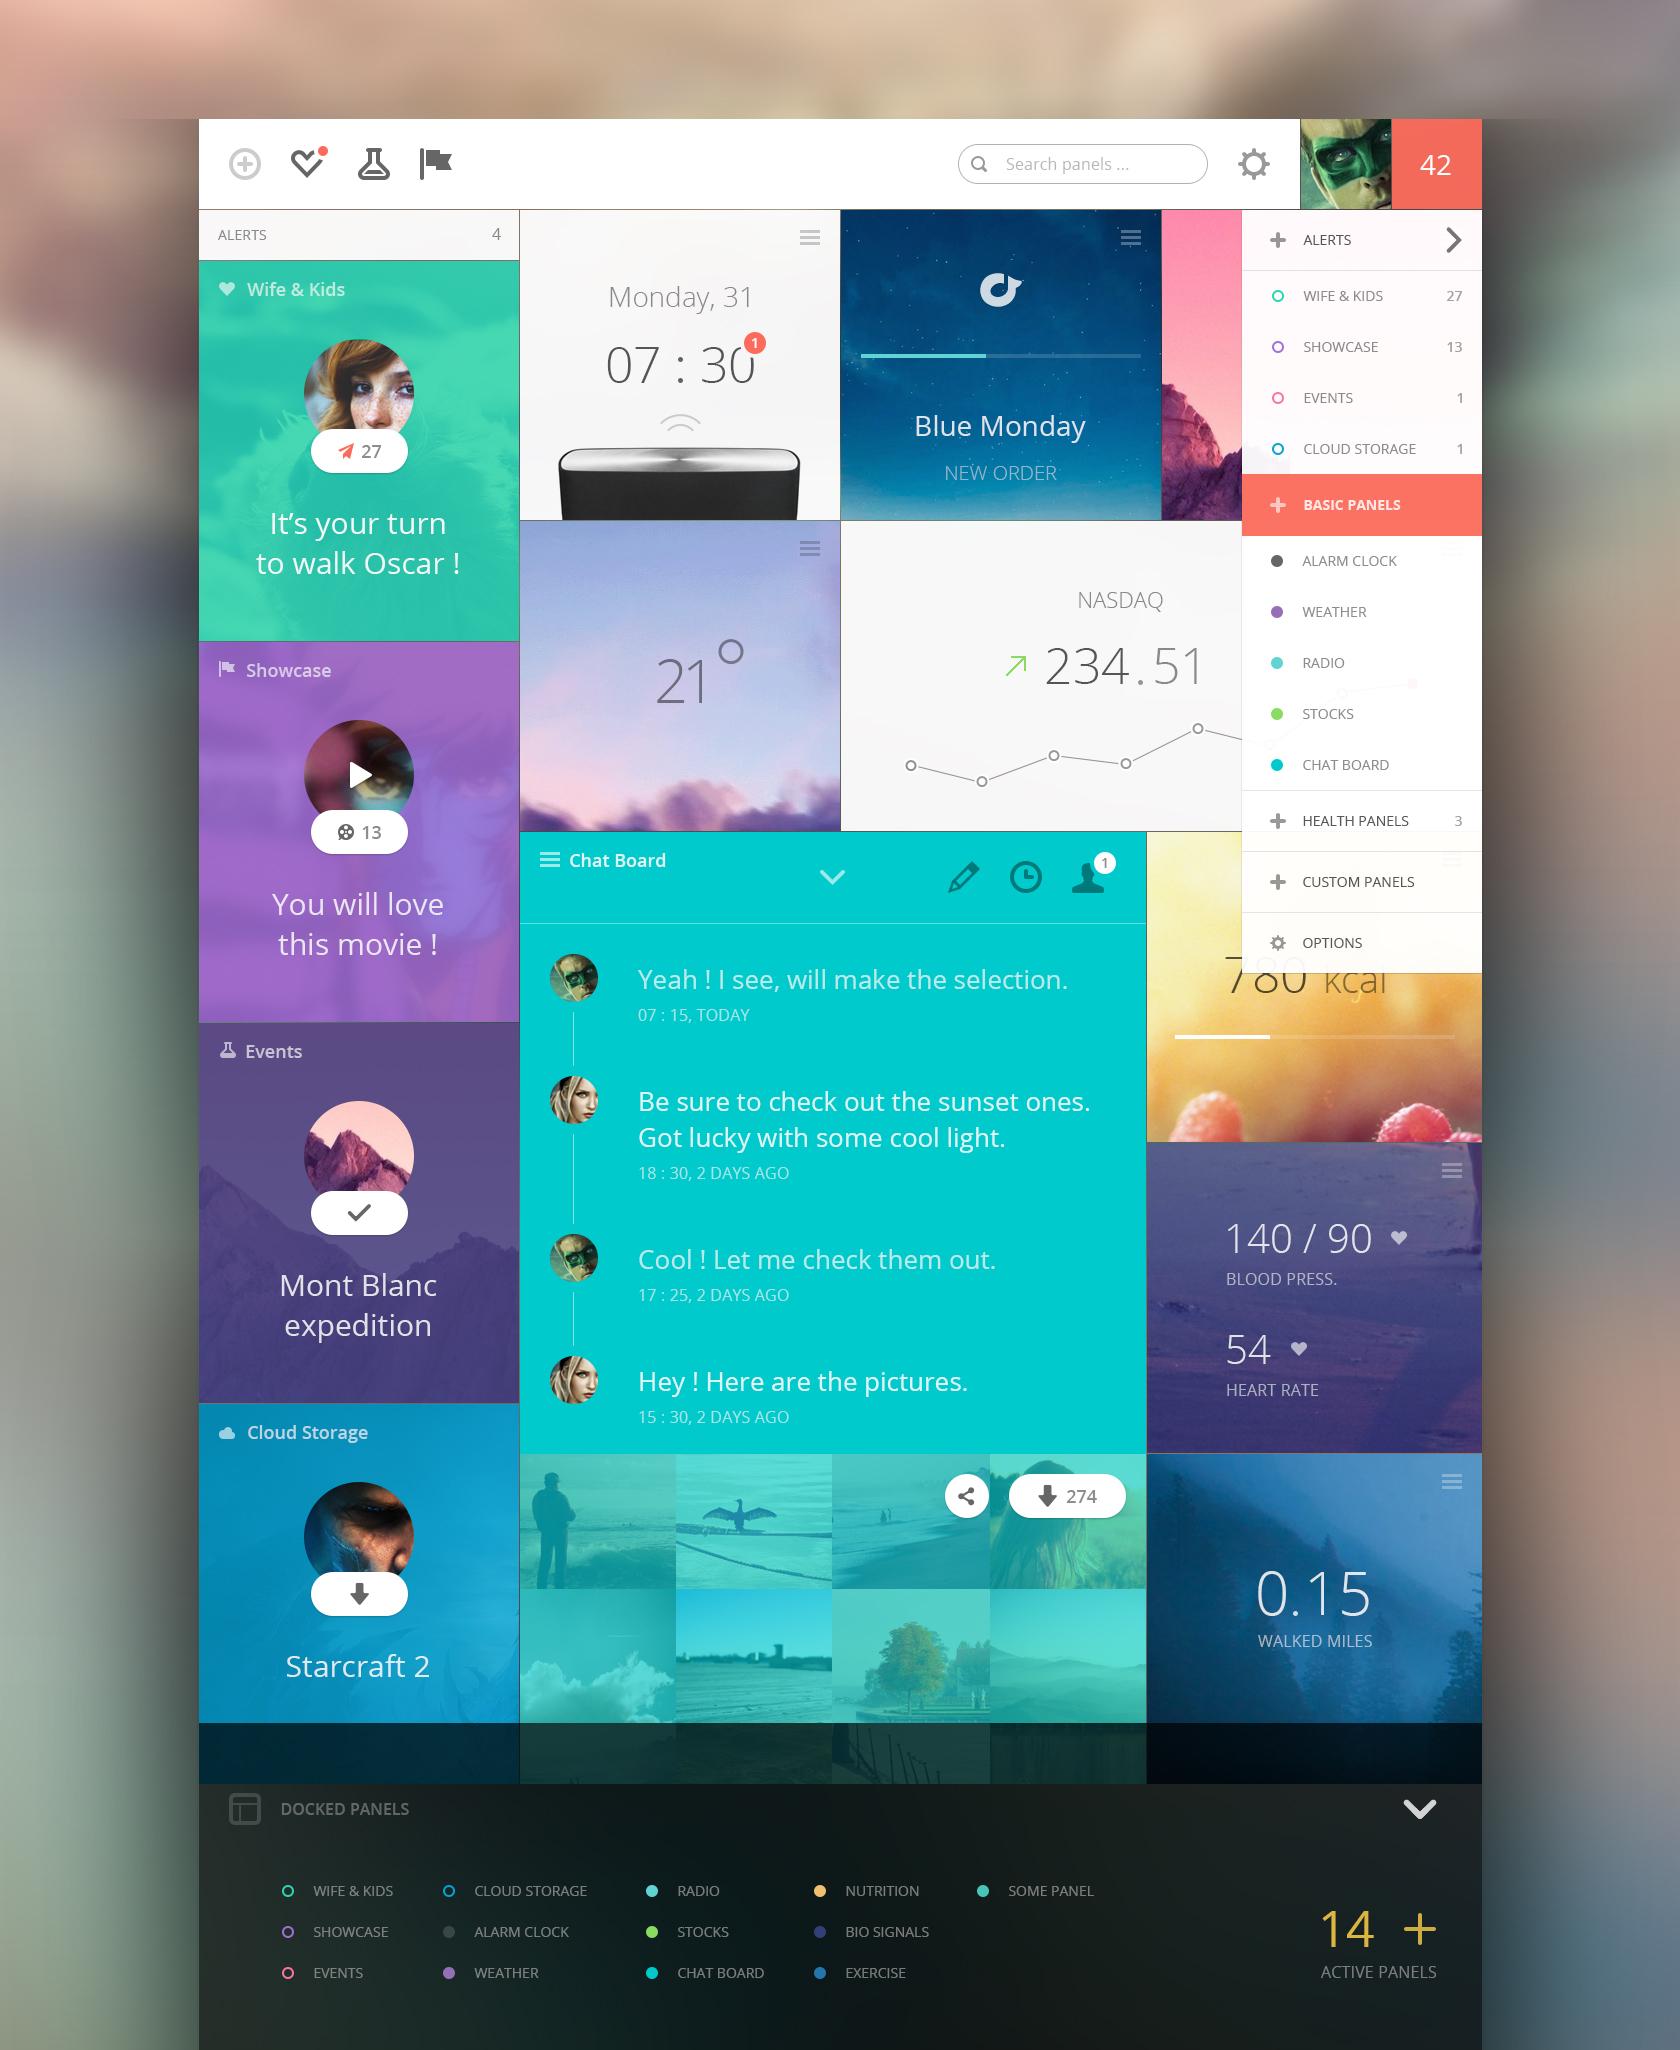 Panels_Dashboard_Bigger.jpg by Cosmin Capitanu